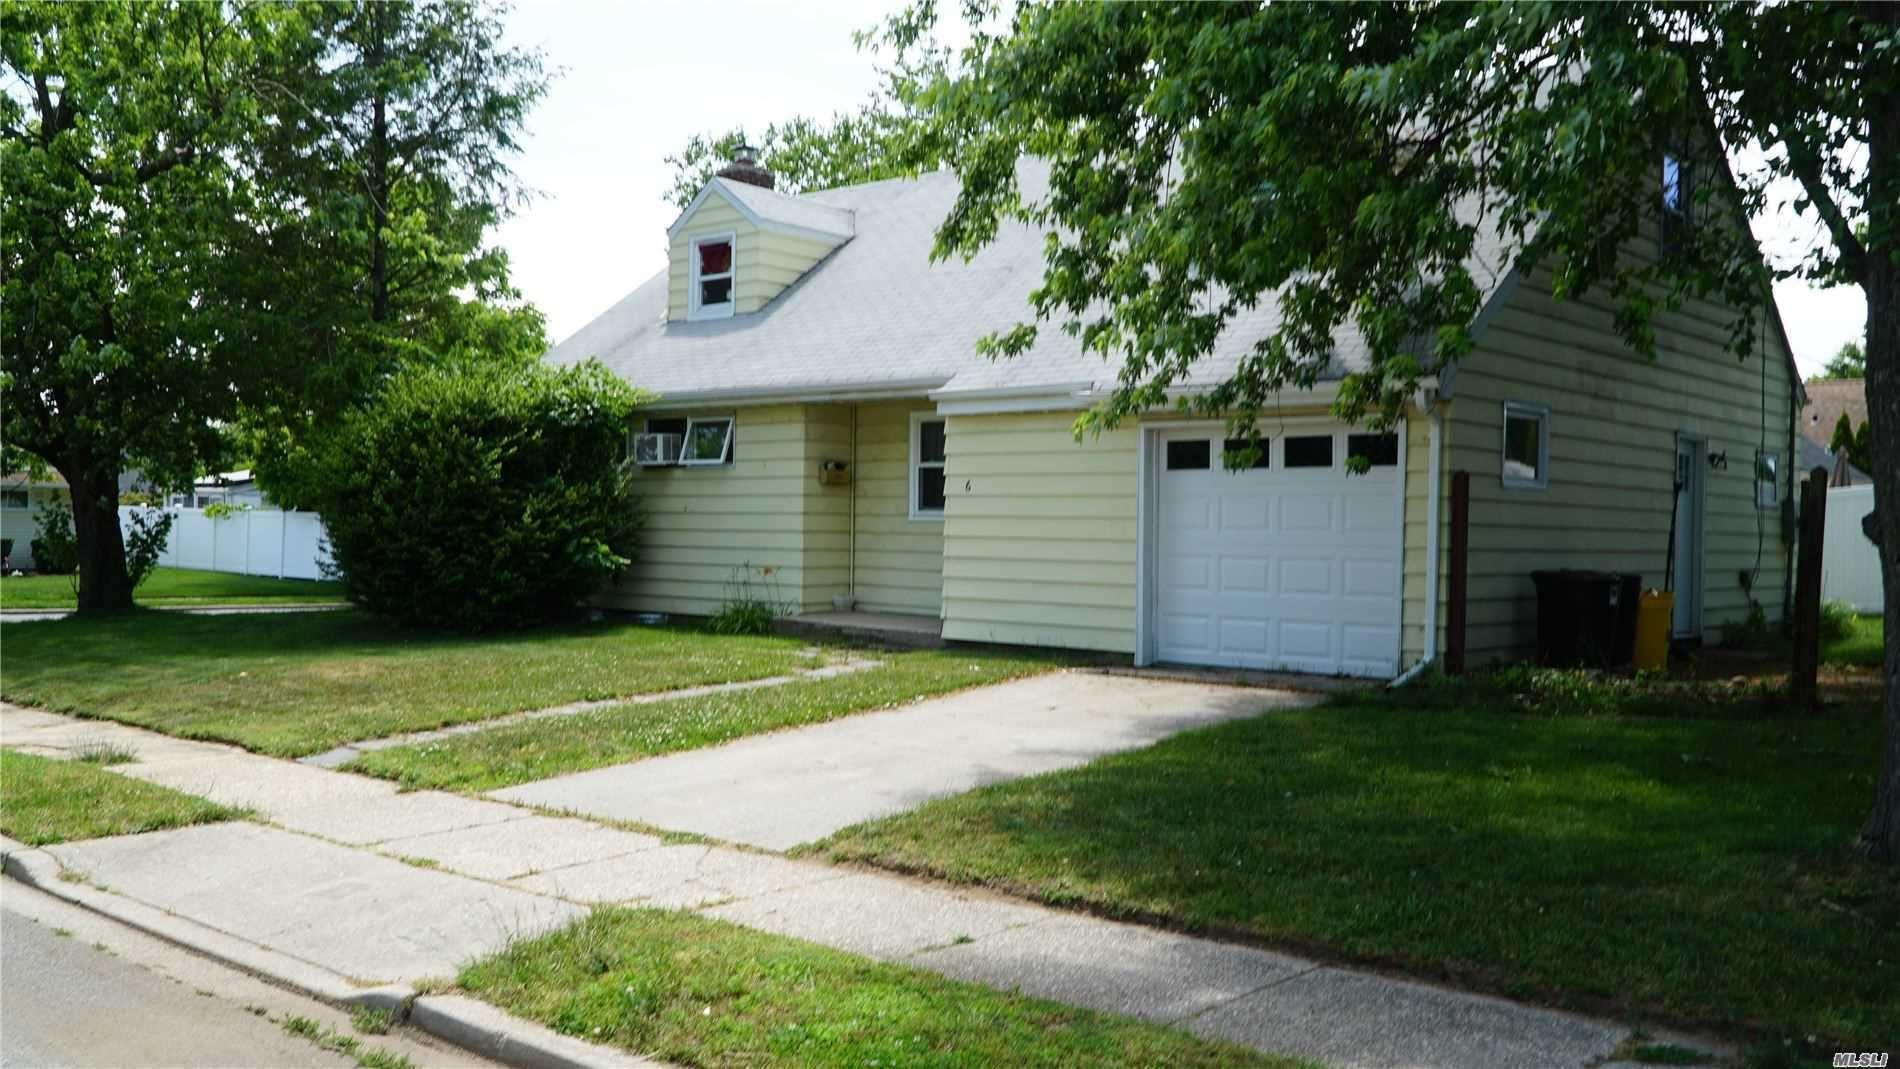 6 Dikeman Court, Hicksville, NY 11801 - MLS#: 3208731